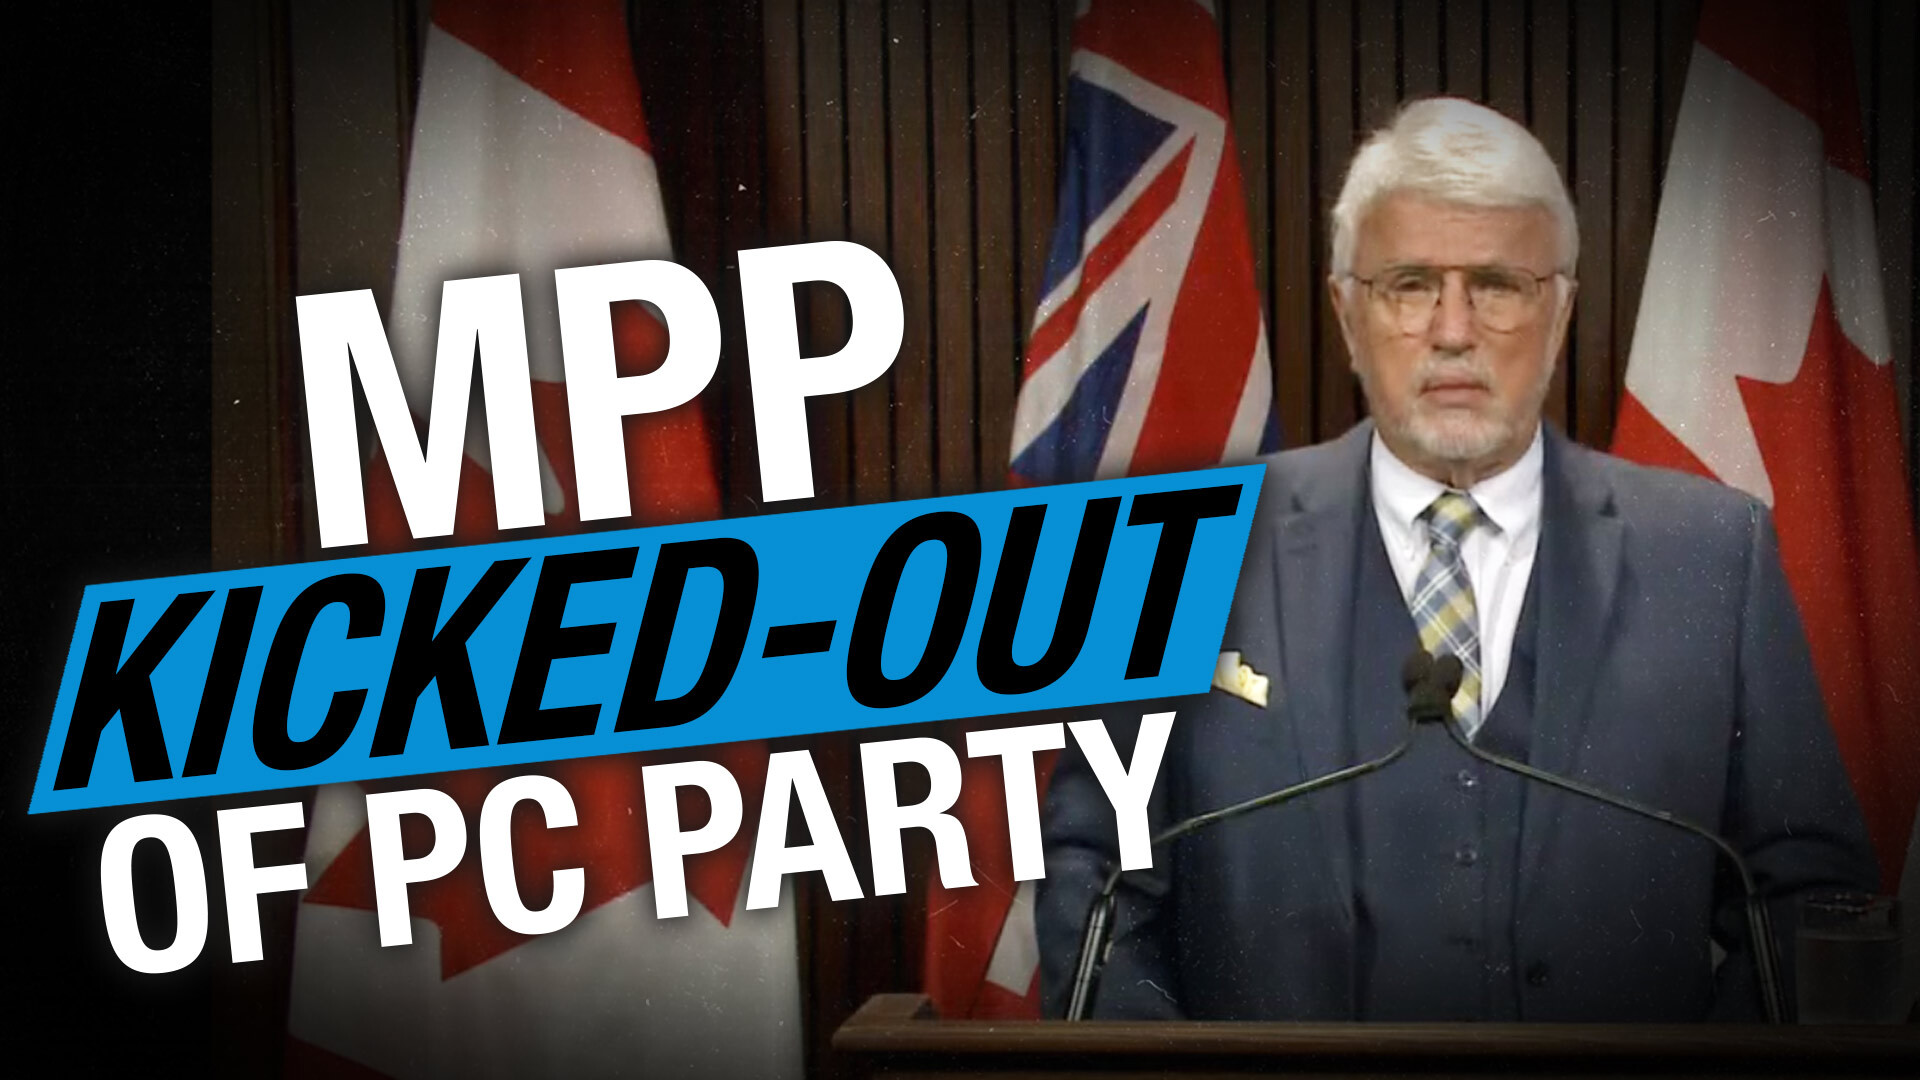 No jab, no job: Premier Ford set to expel MPP Rick Nicholls for not taking vaccine